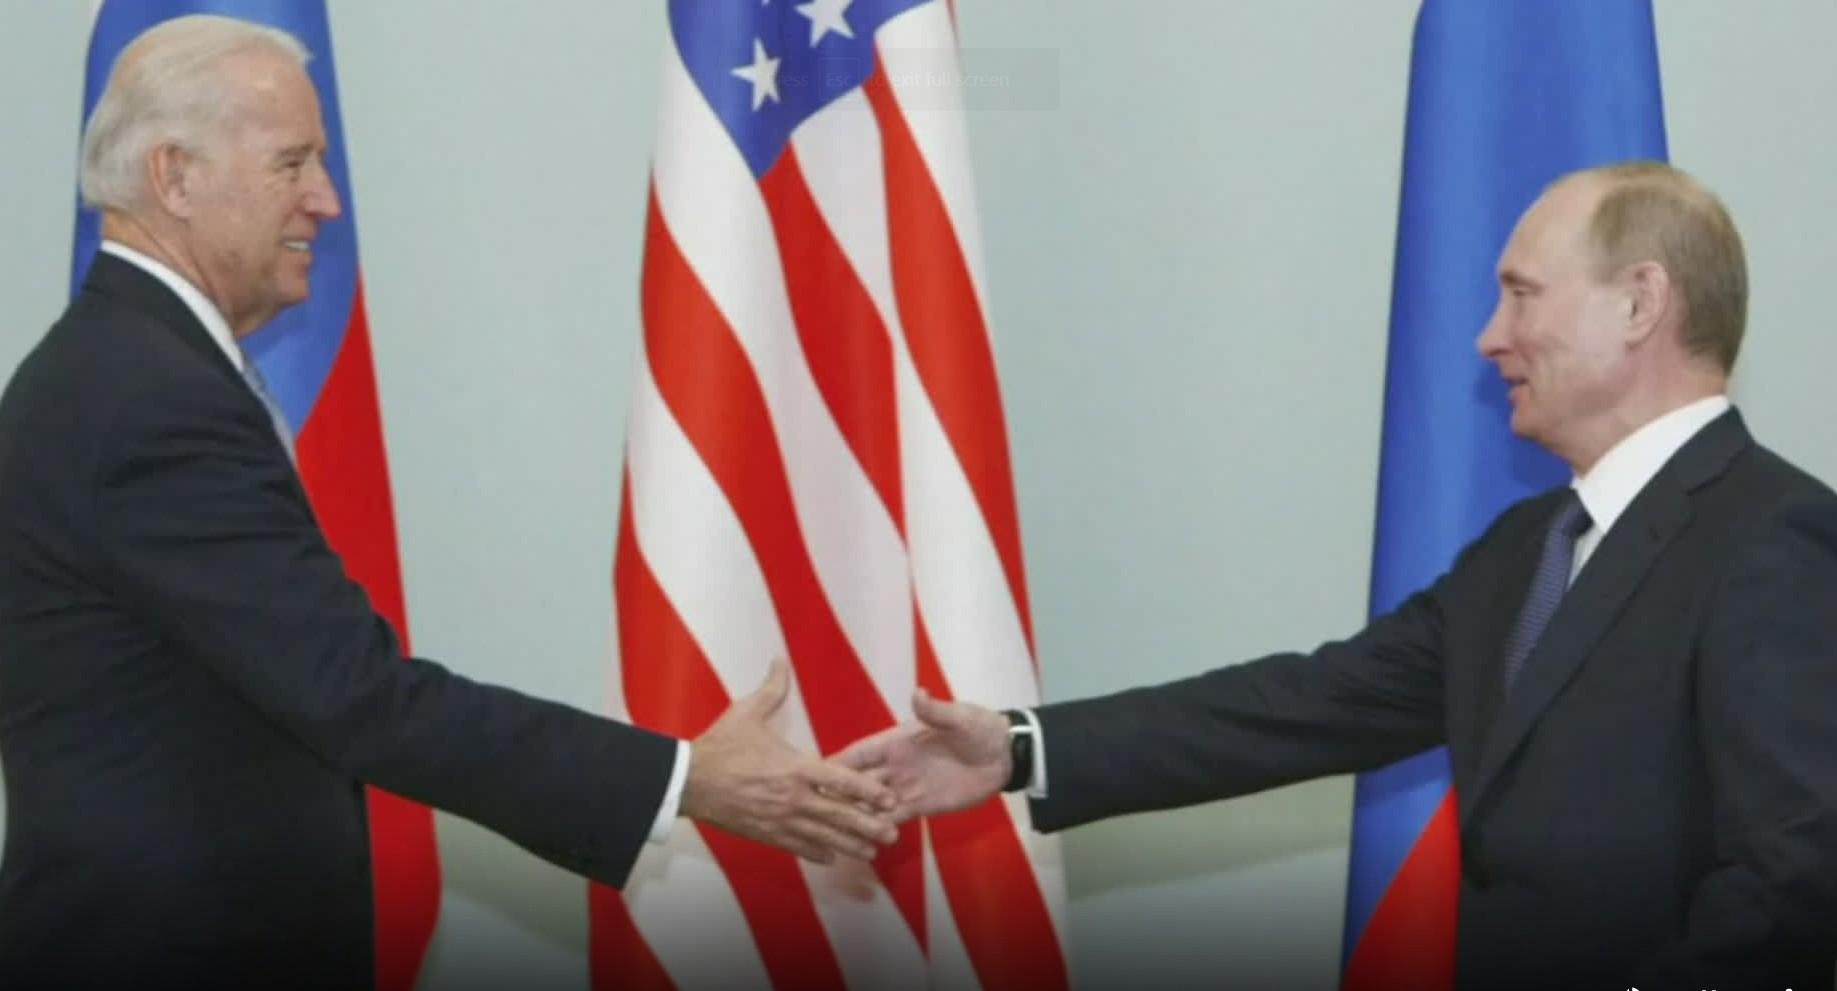 Pure Business' at Biden-Putin Summit: No Hugs, no Brickbats